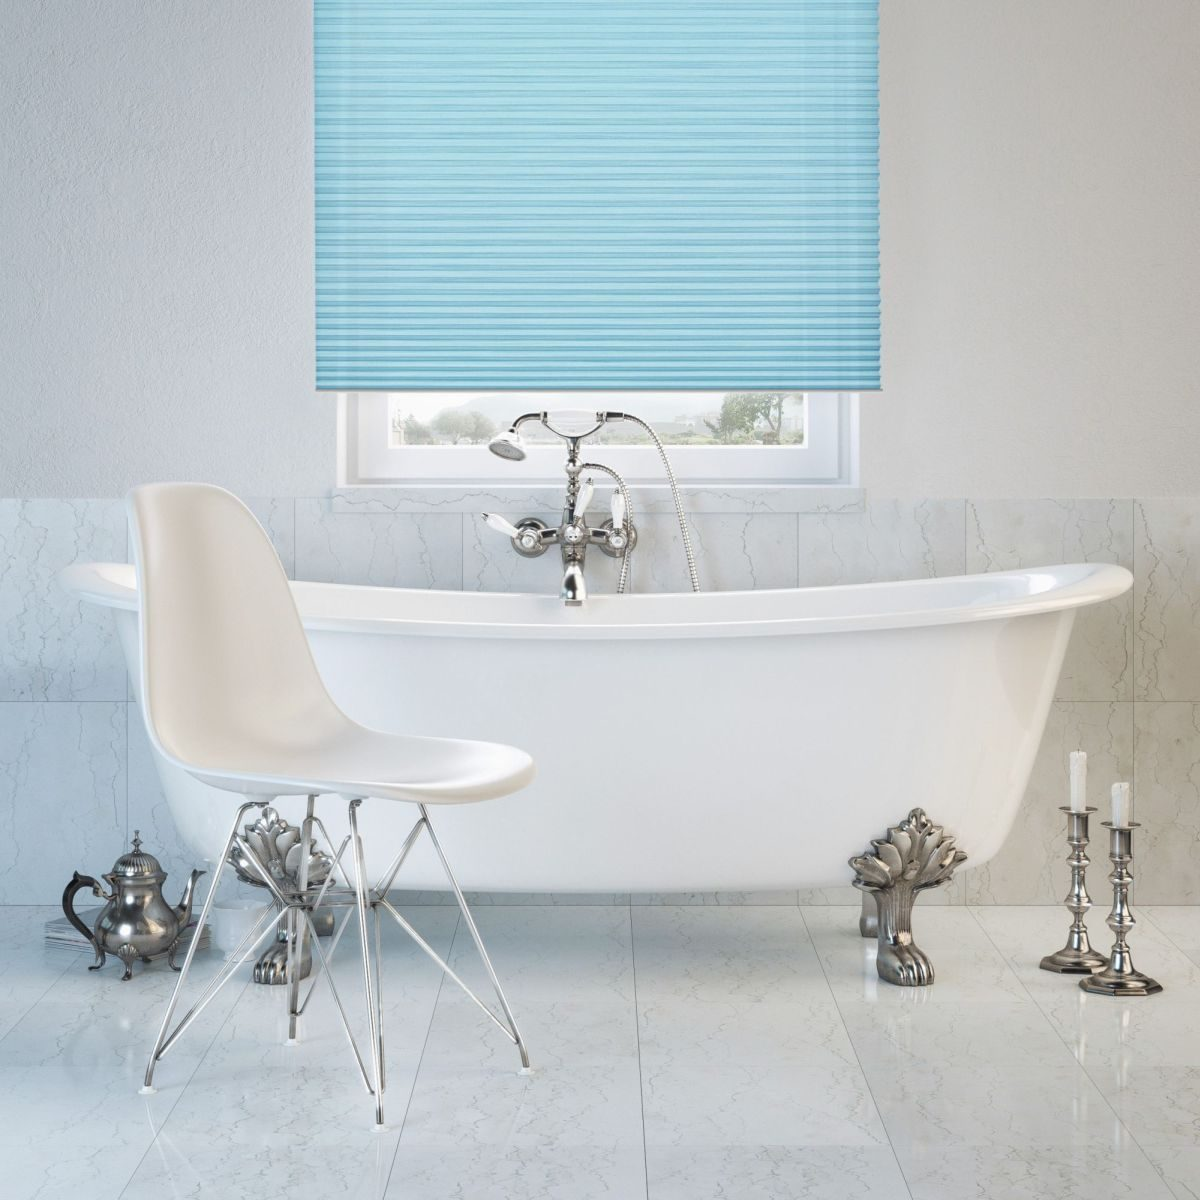 isotra_plisse_capri-easy-care_koupelna-1200x1200.jpg